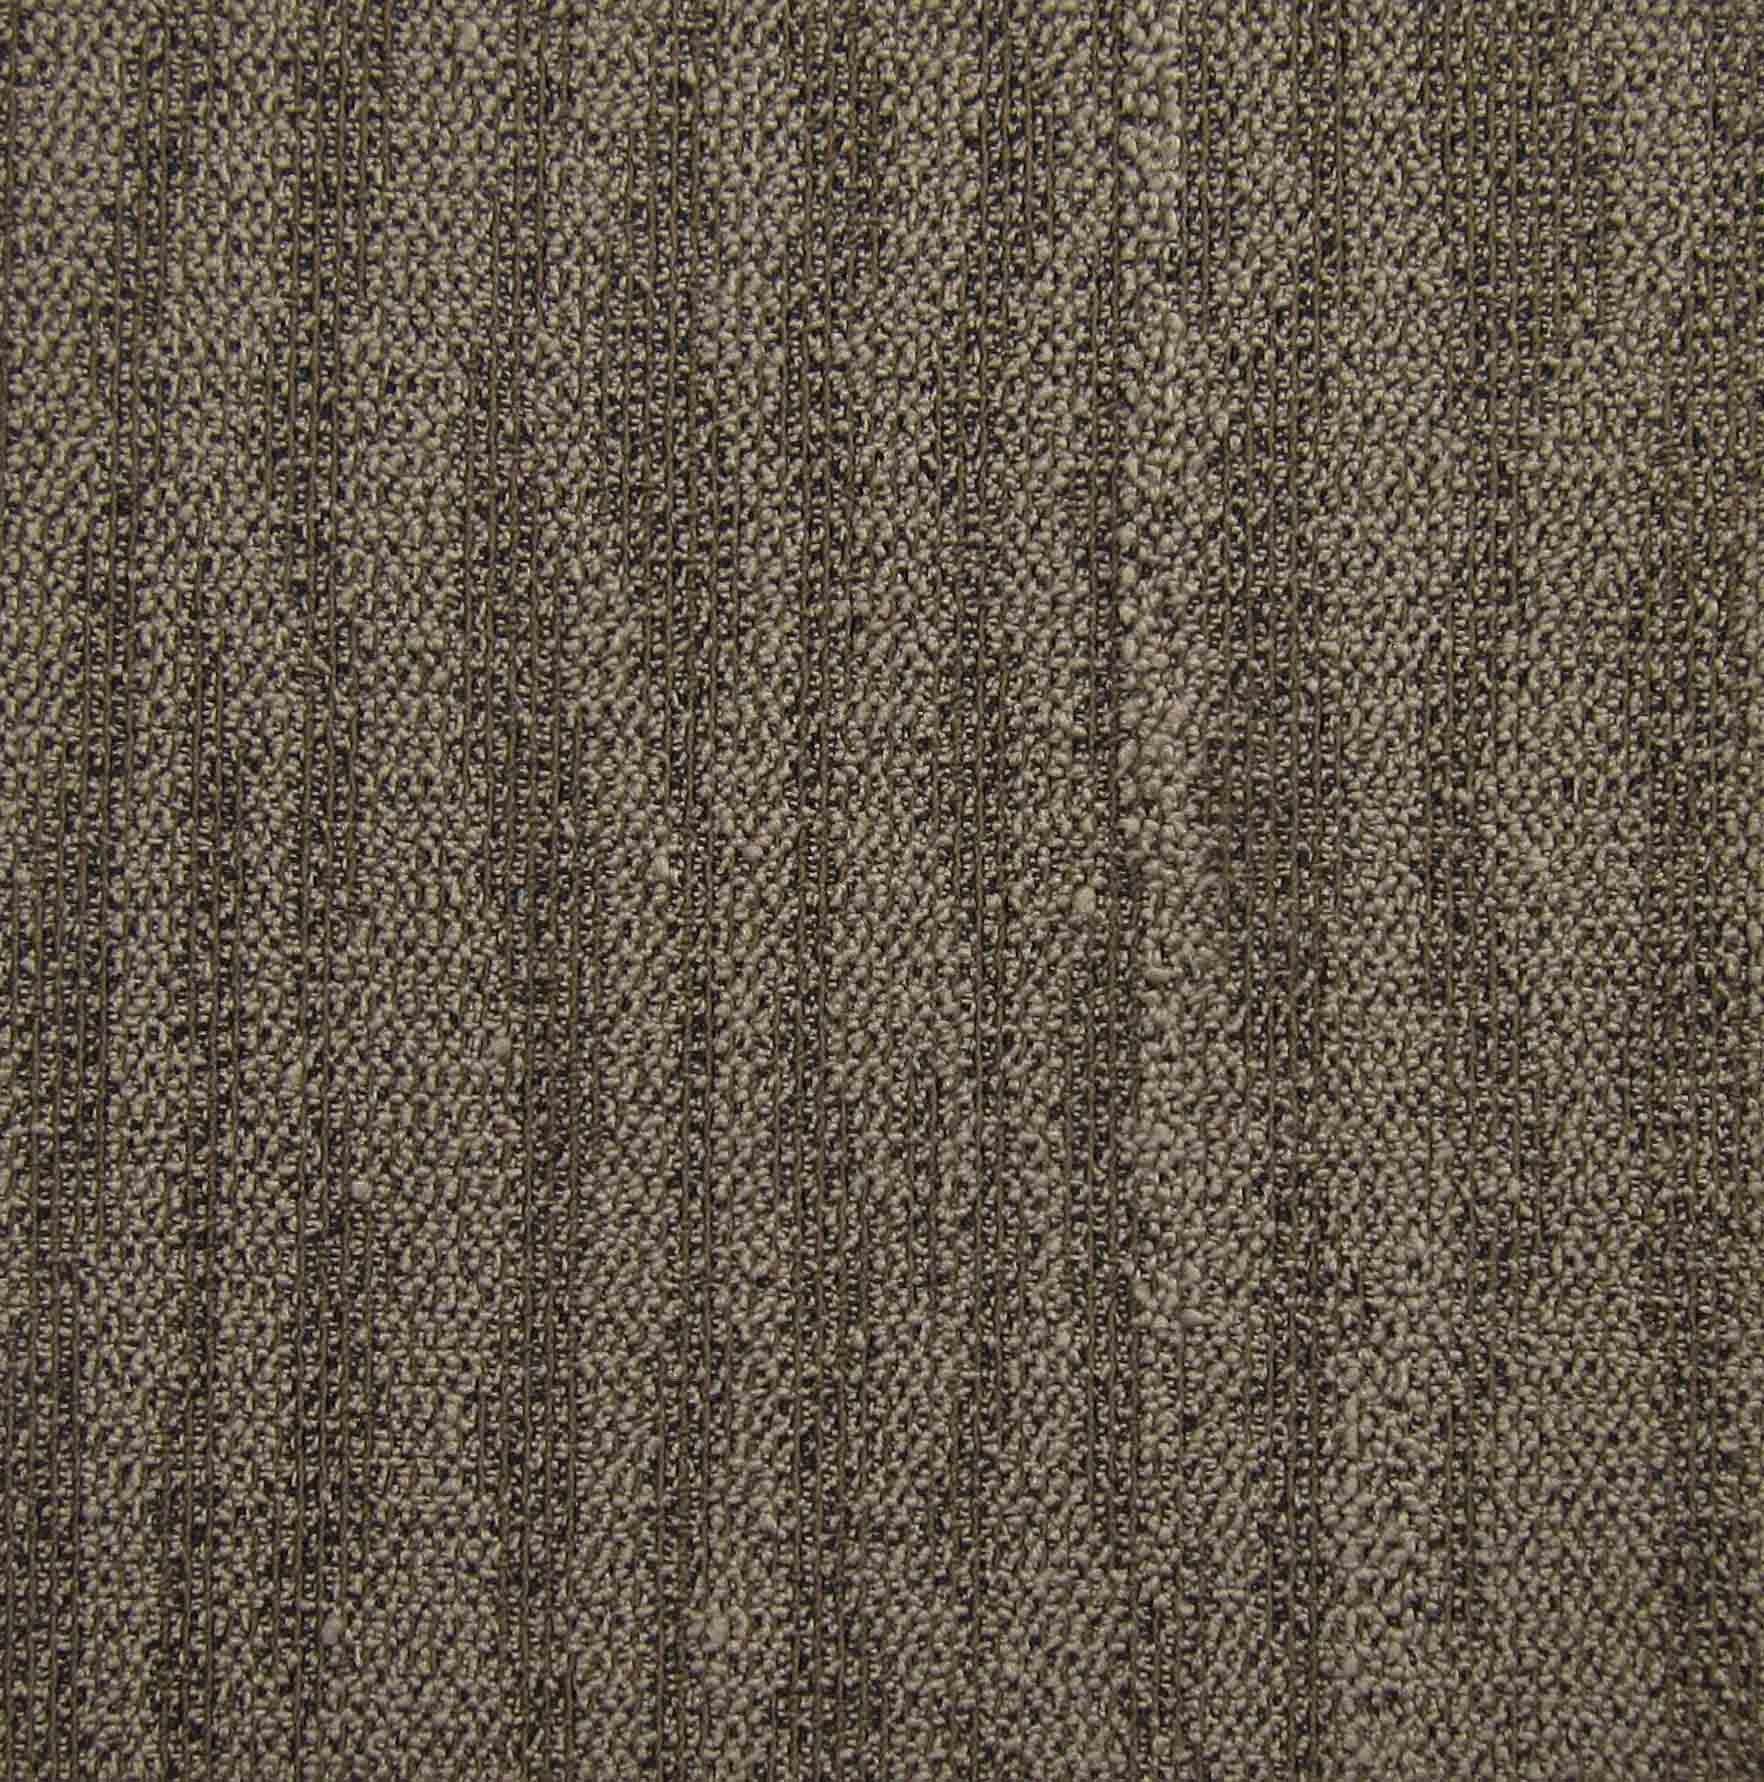 where can i buy wallto wall Plain Modular Carpet